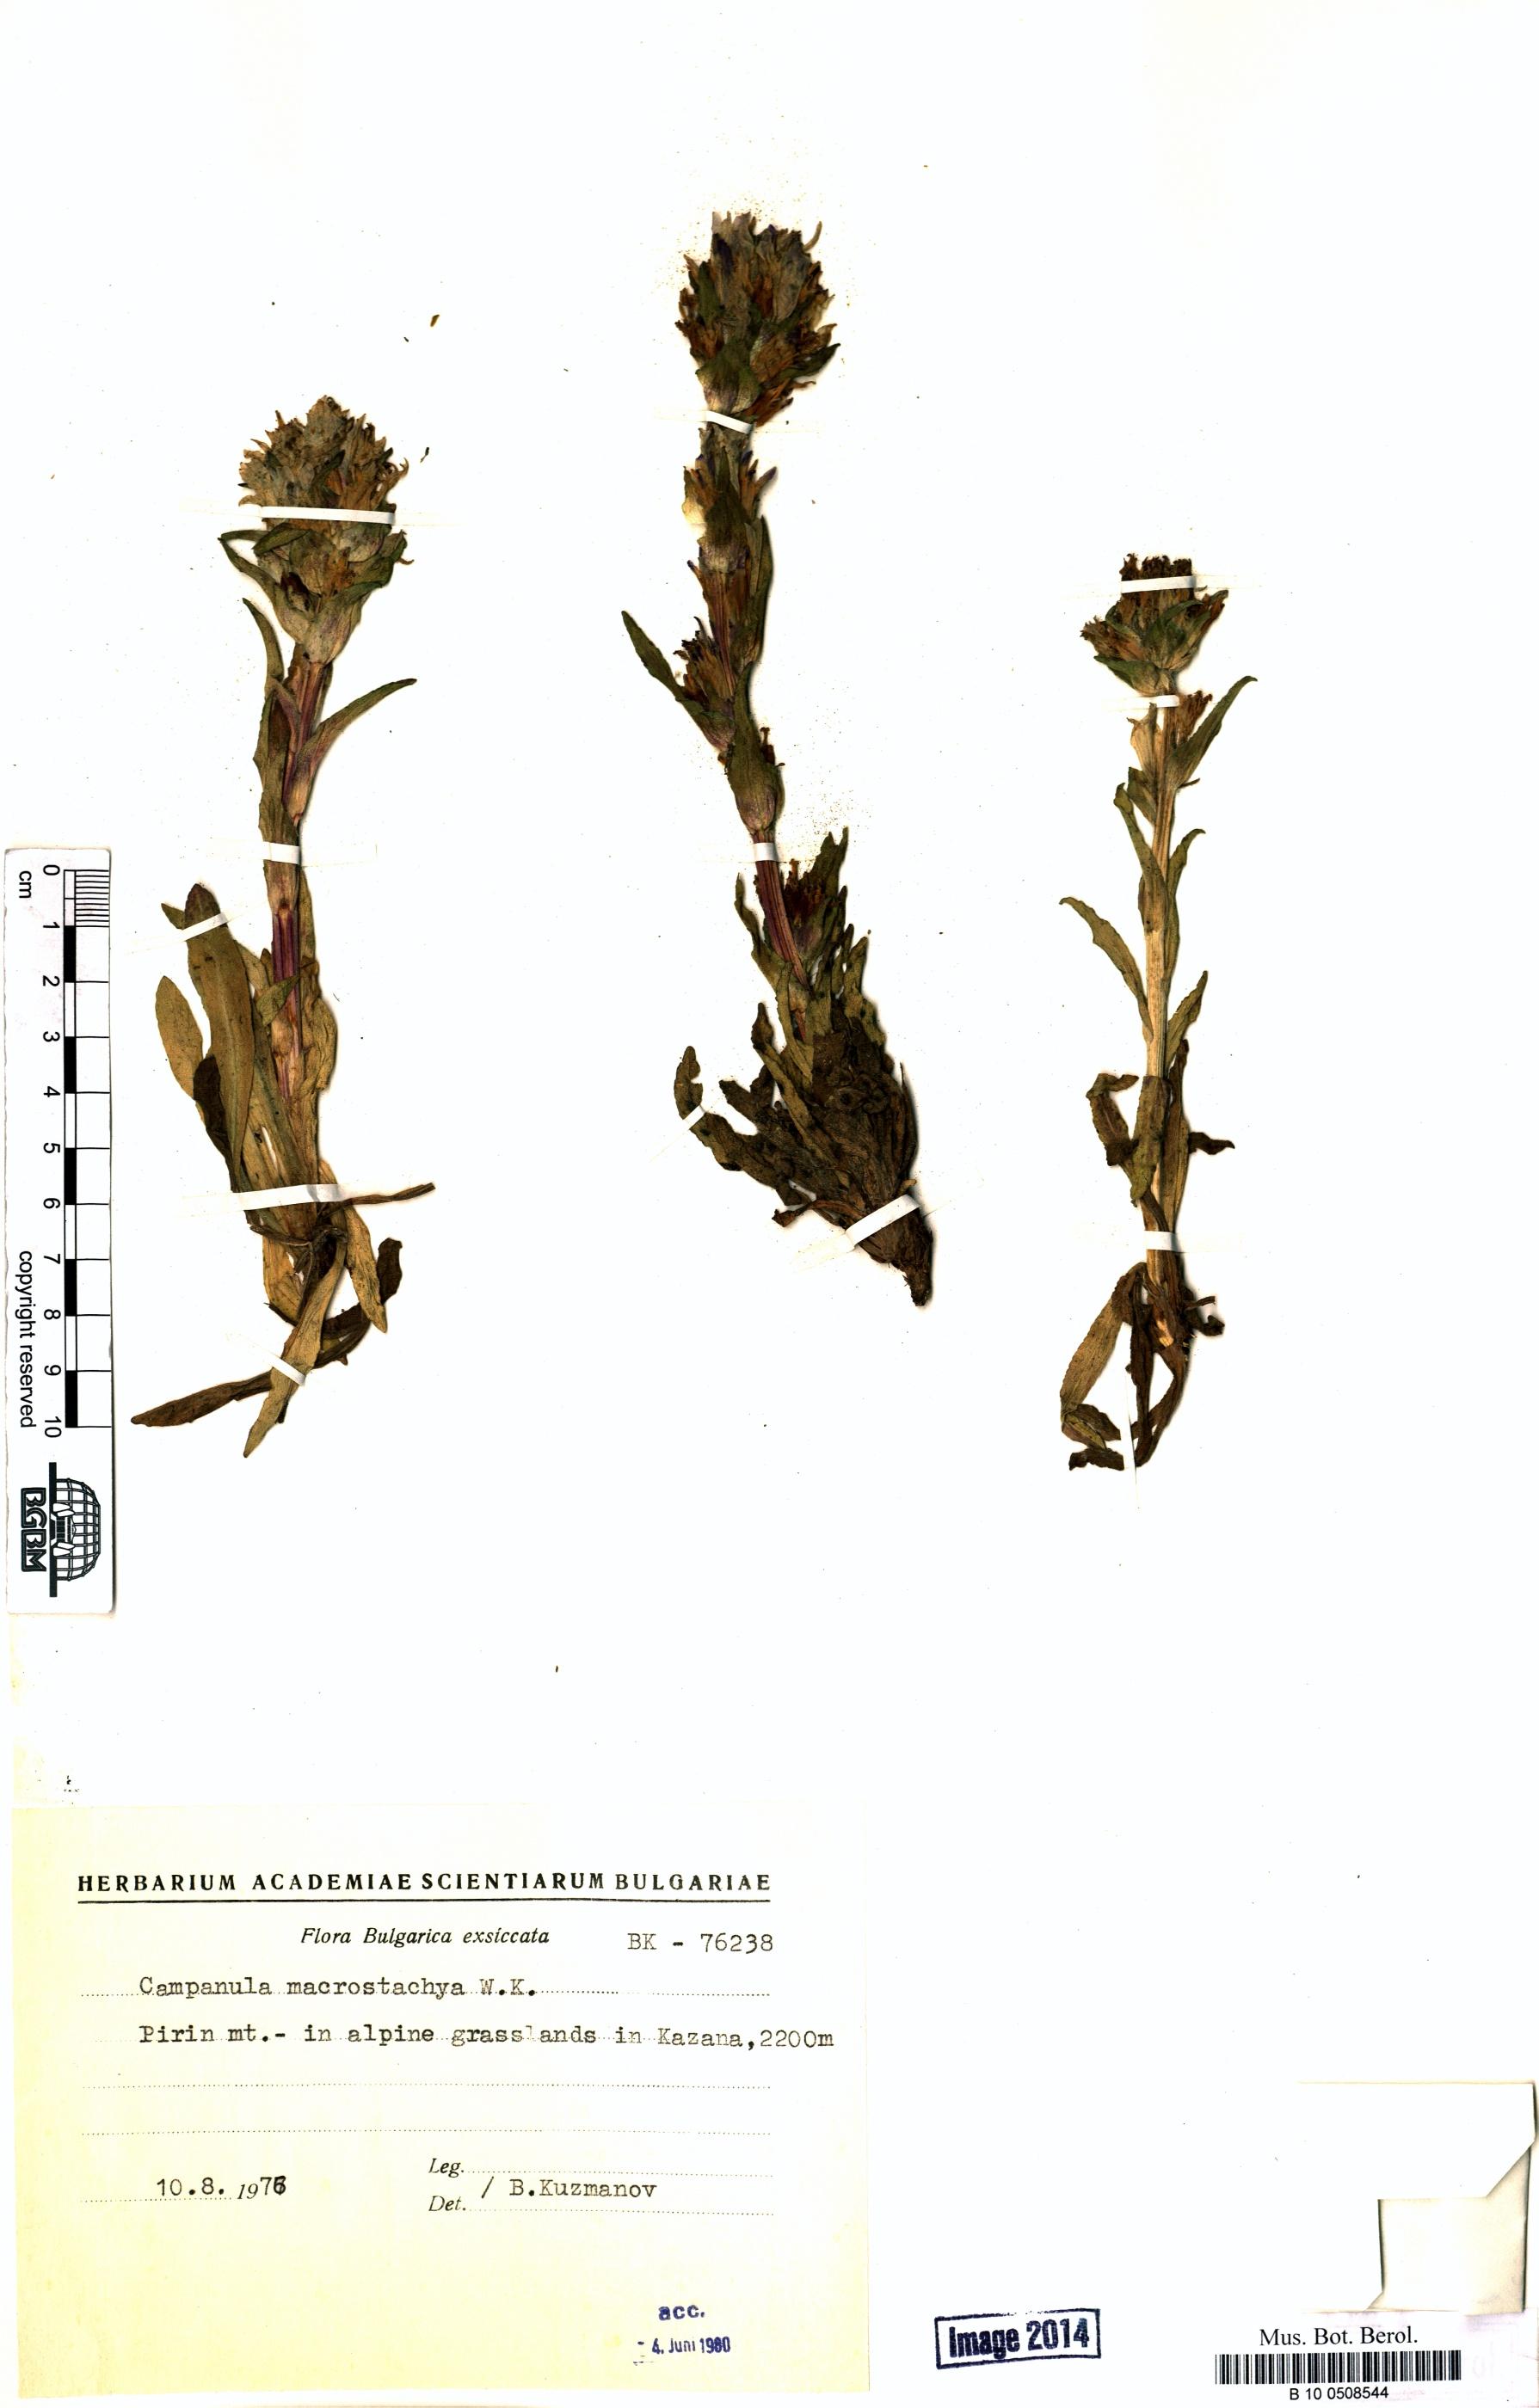 http://ww2.bgbm.org/herbarium/images/B/10/05/08/54/B_10_0508544.jpg